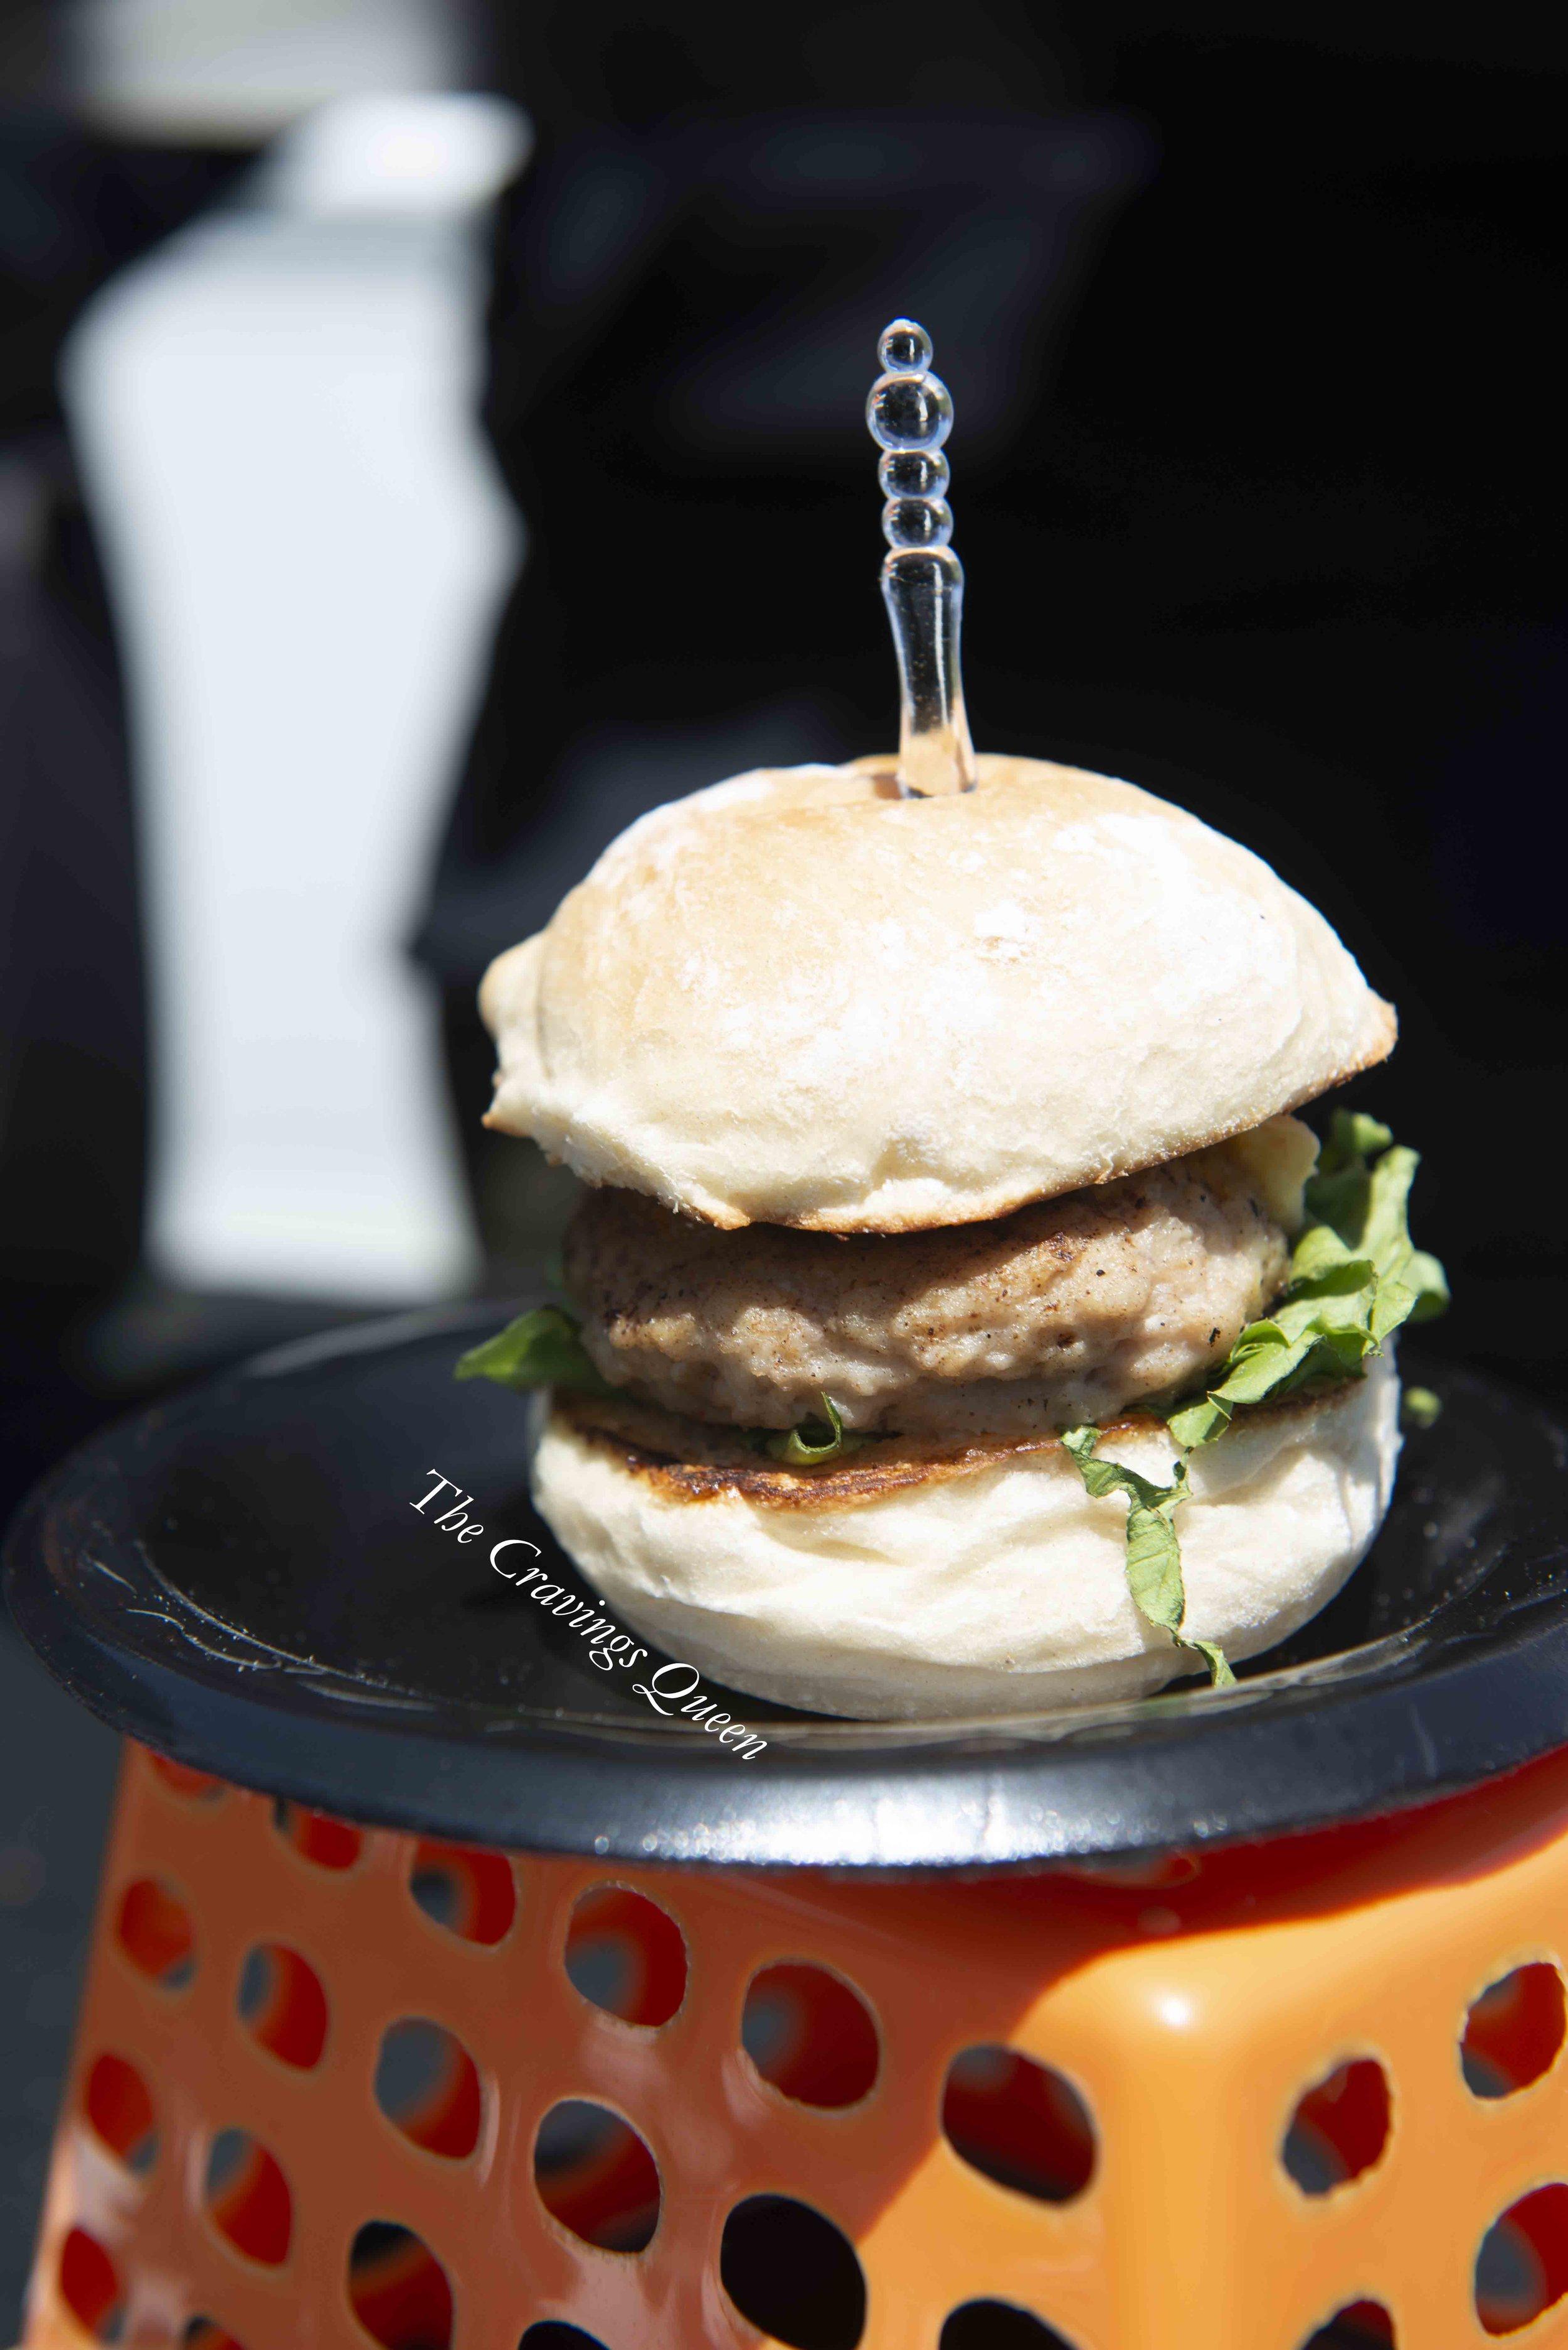 J&K Style Grill - Keona's Ultimate Turkey Burger